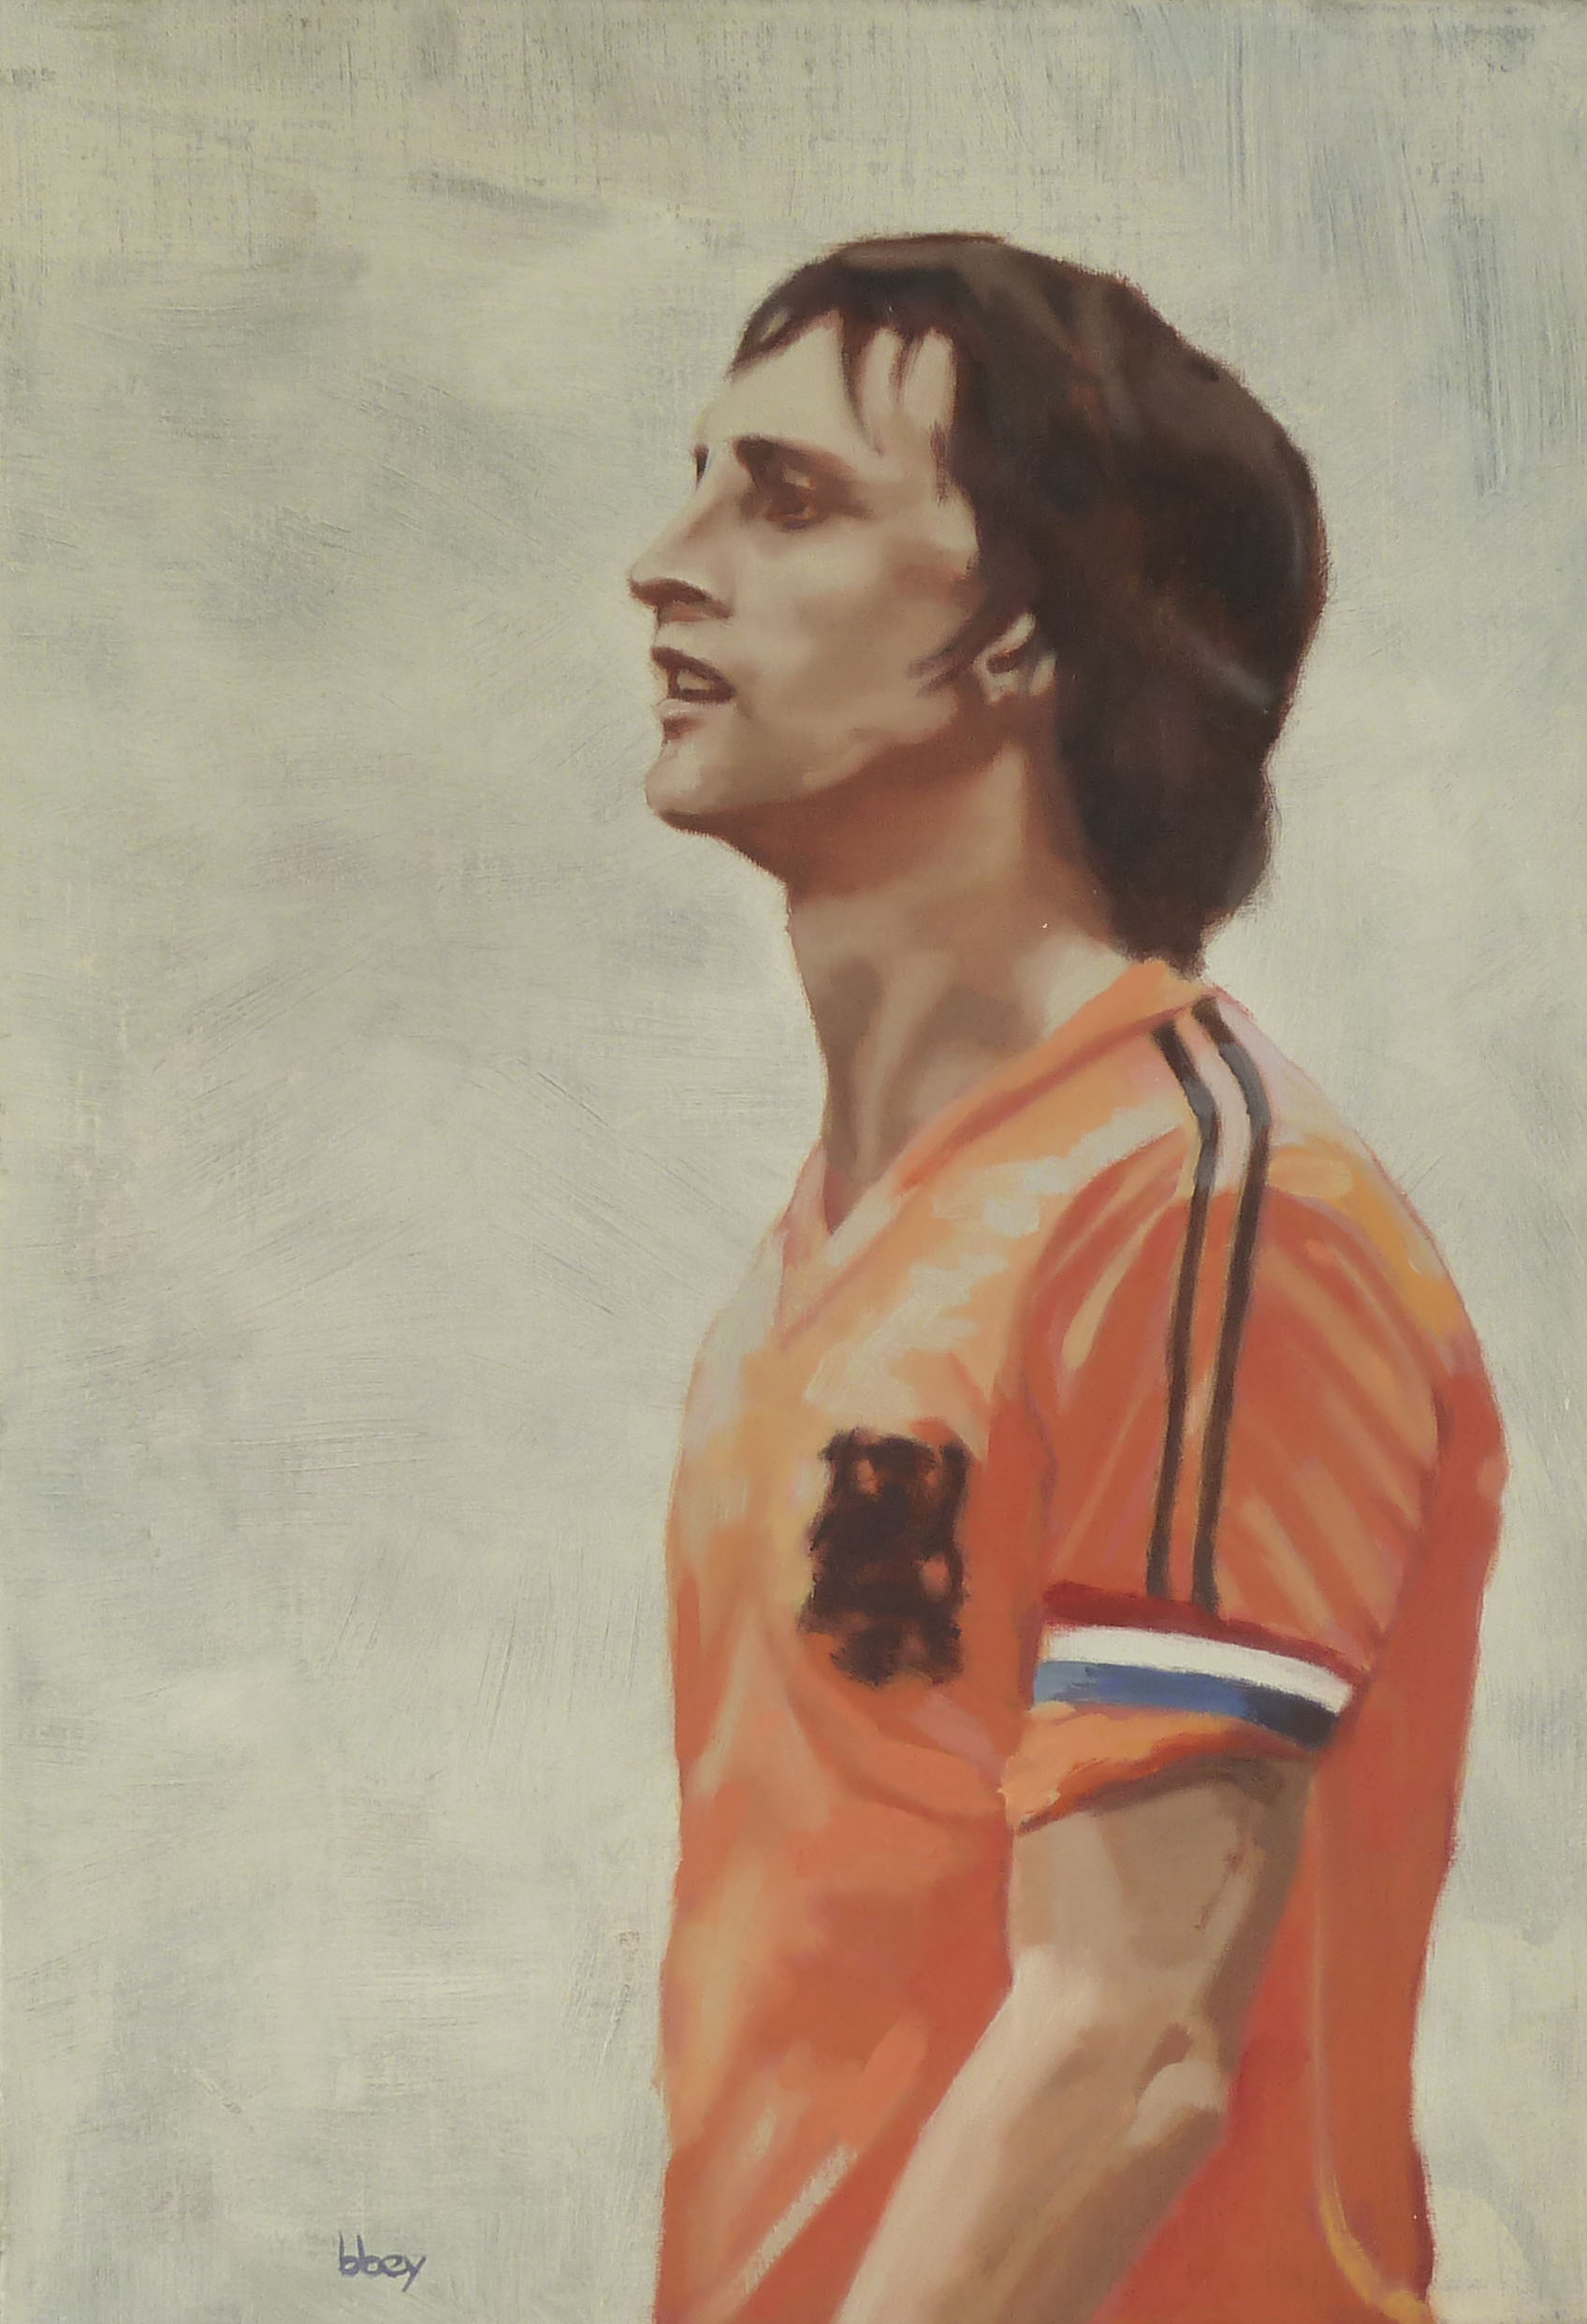 Johan2